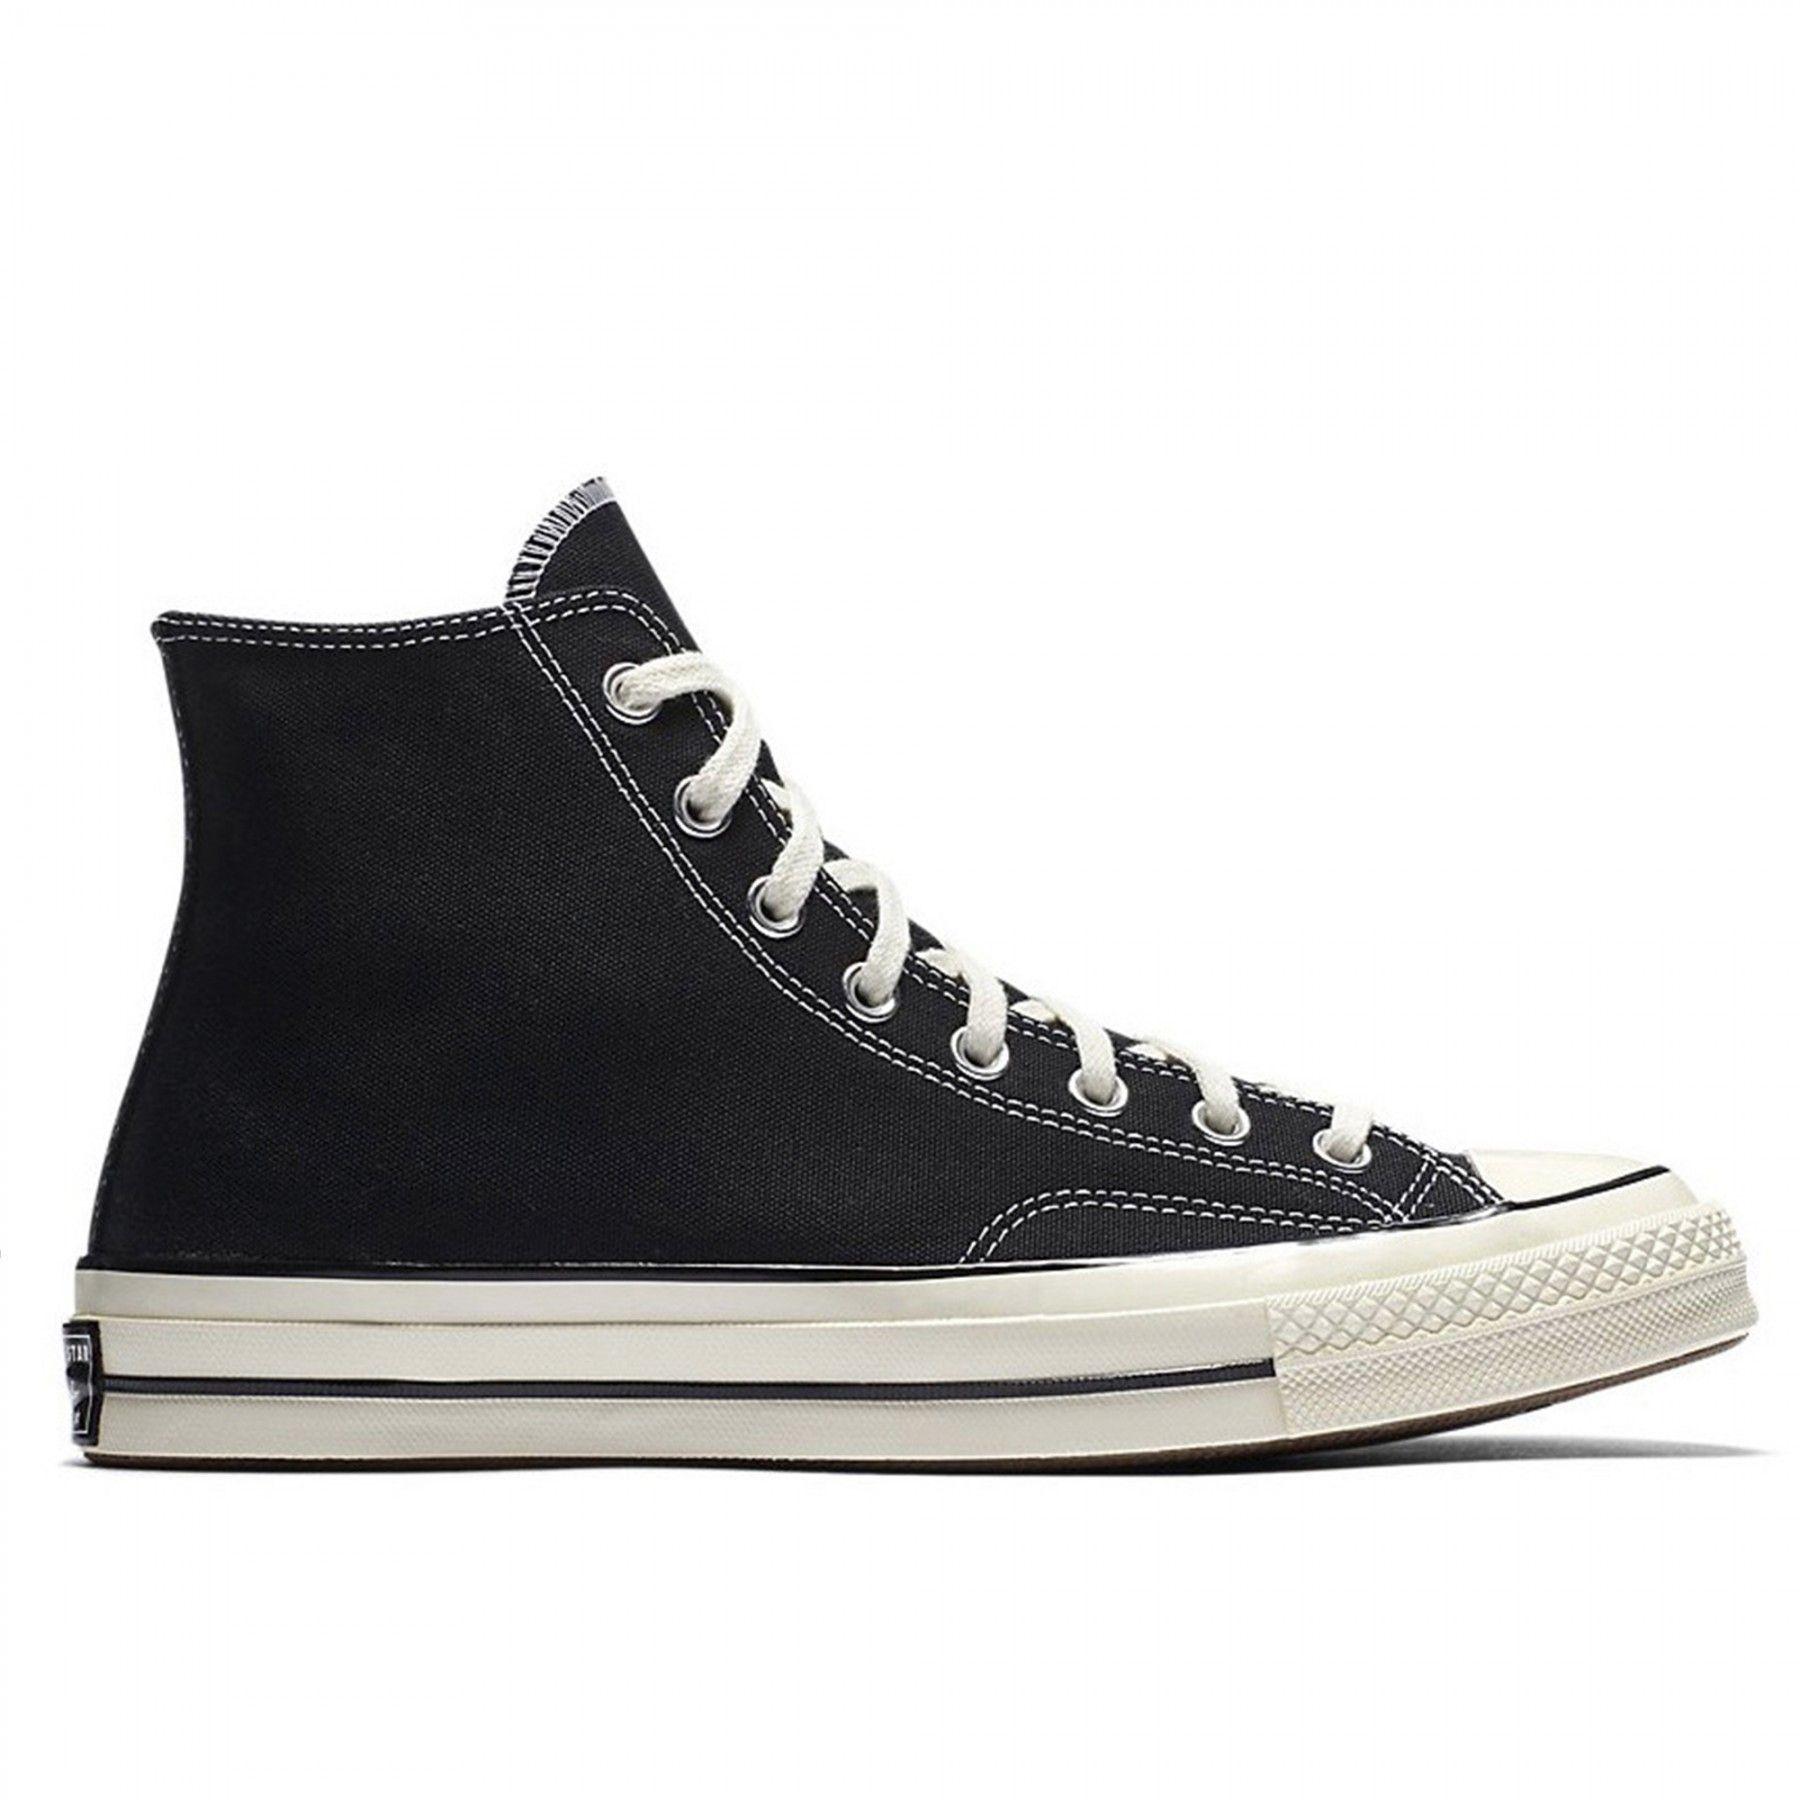 Converse Chuck Taylor 70's OX High (Black) NEED A NEW PAIR